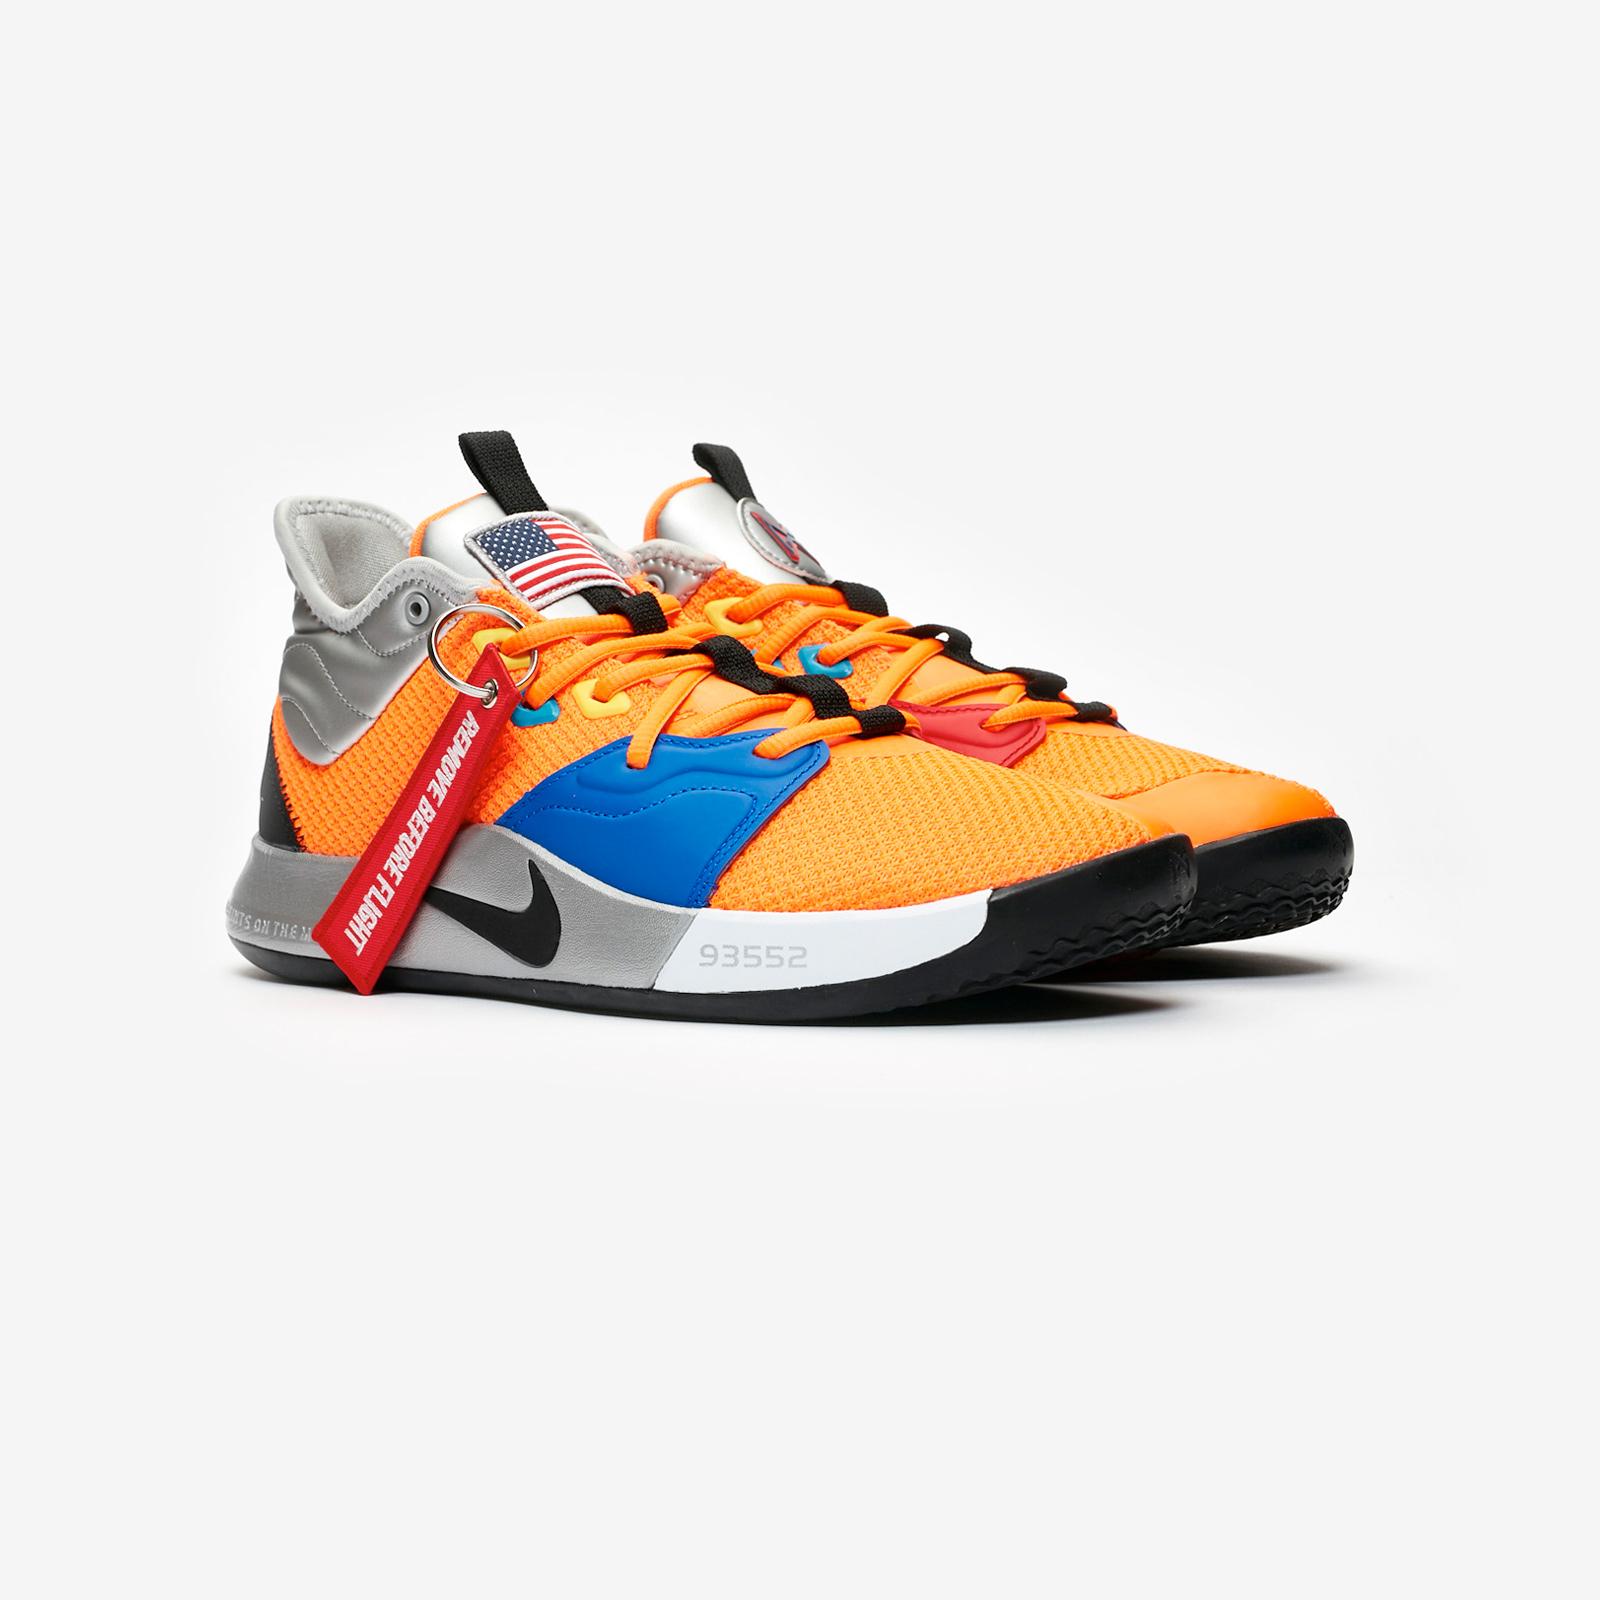 promo code 2cfb3 d0081 Nike Basketball PG 3 NASA